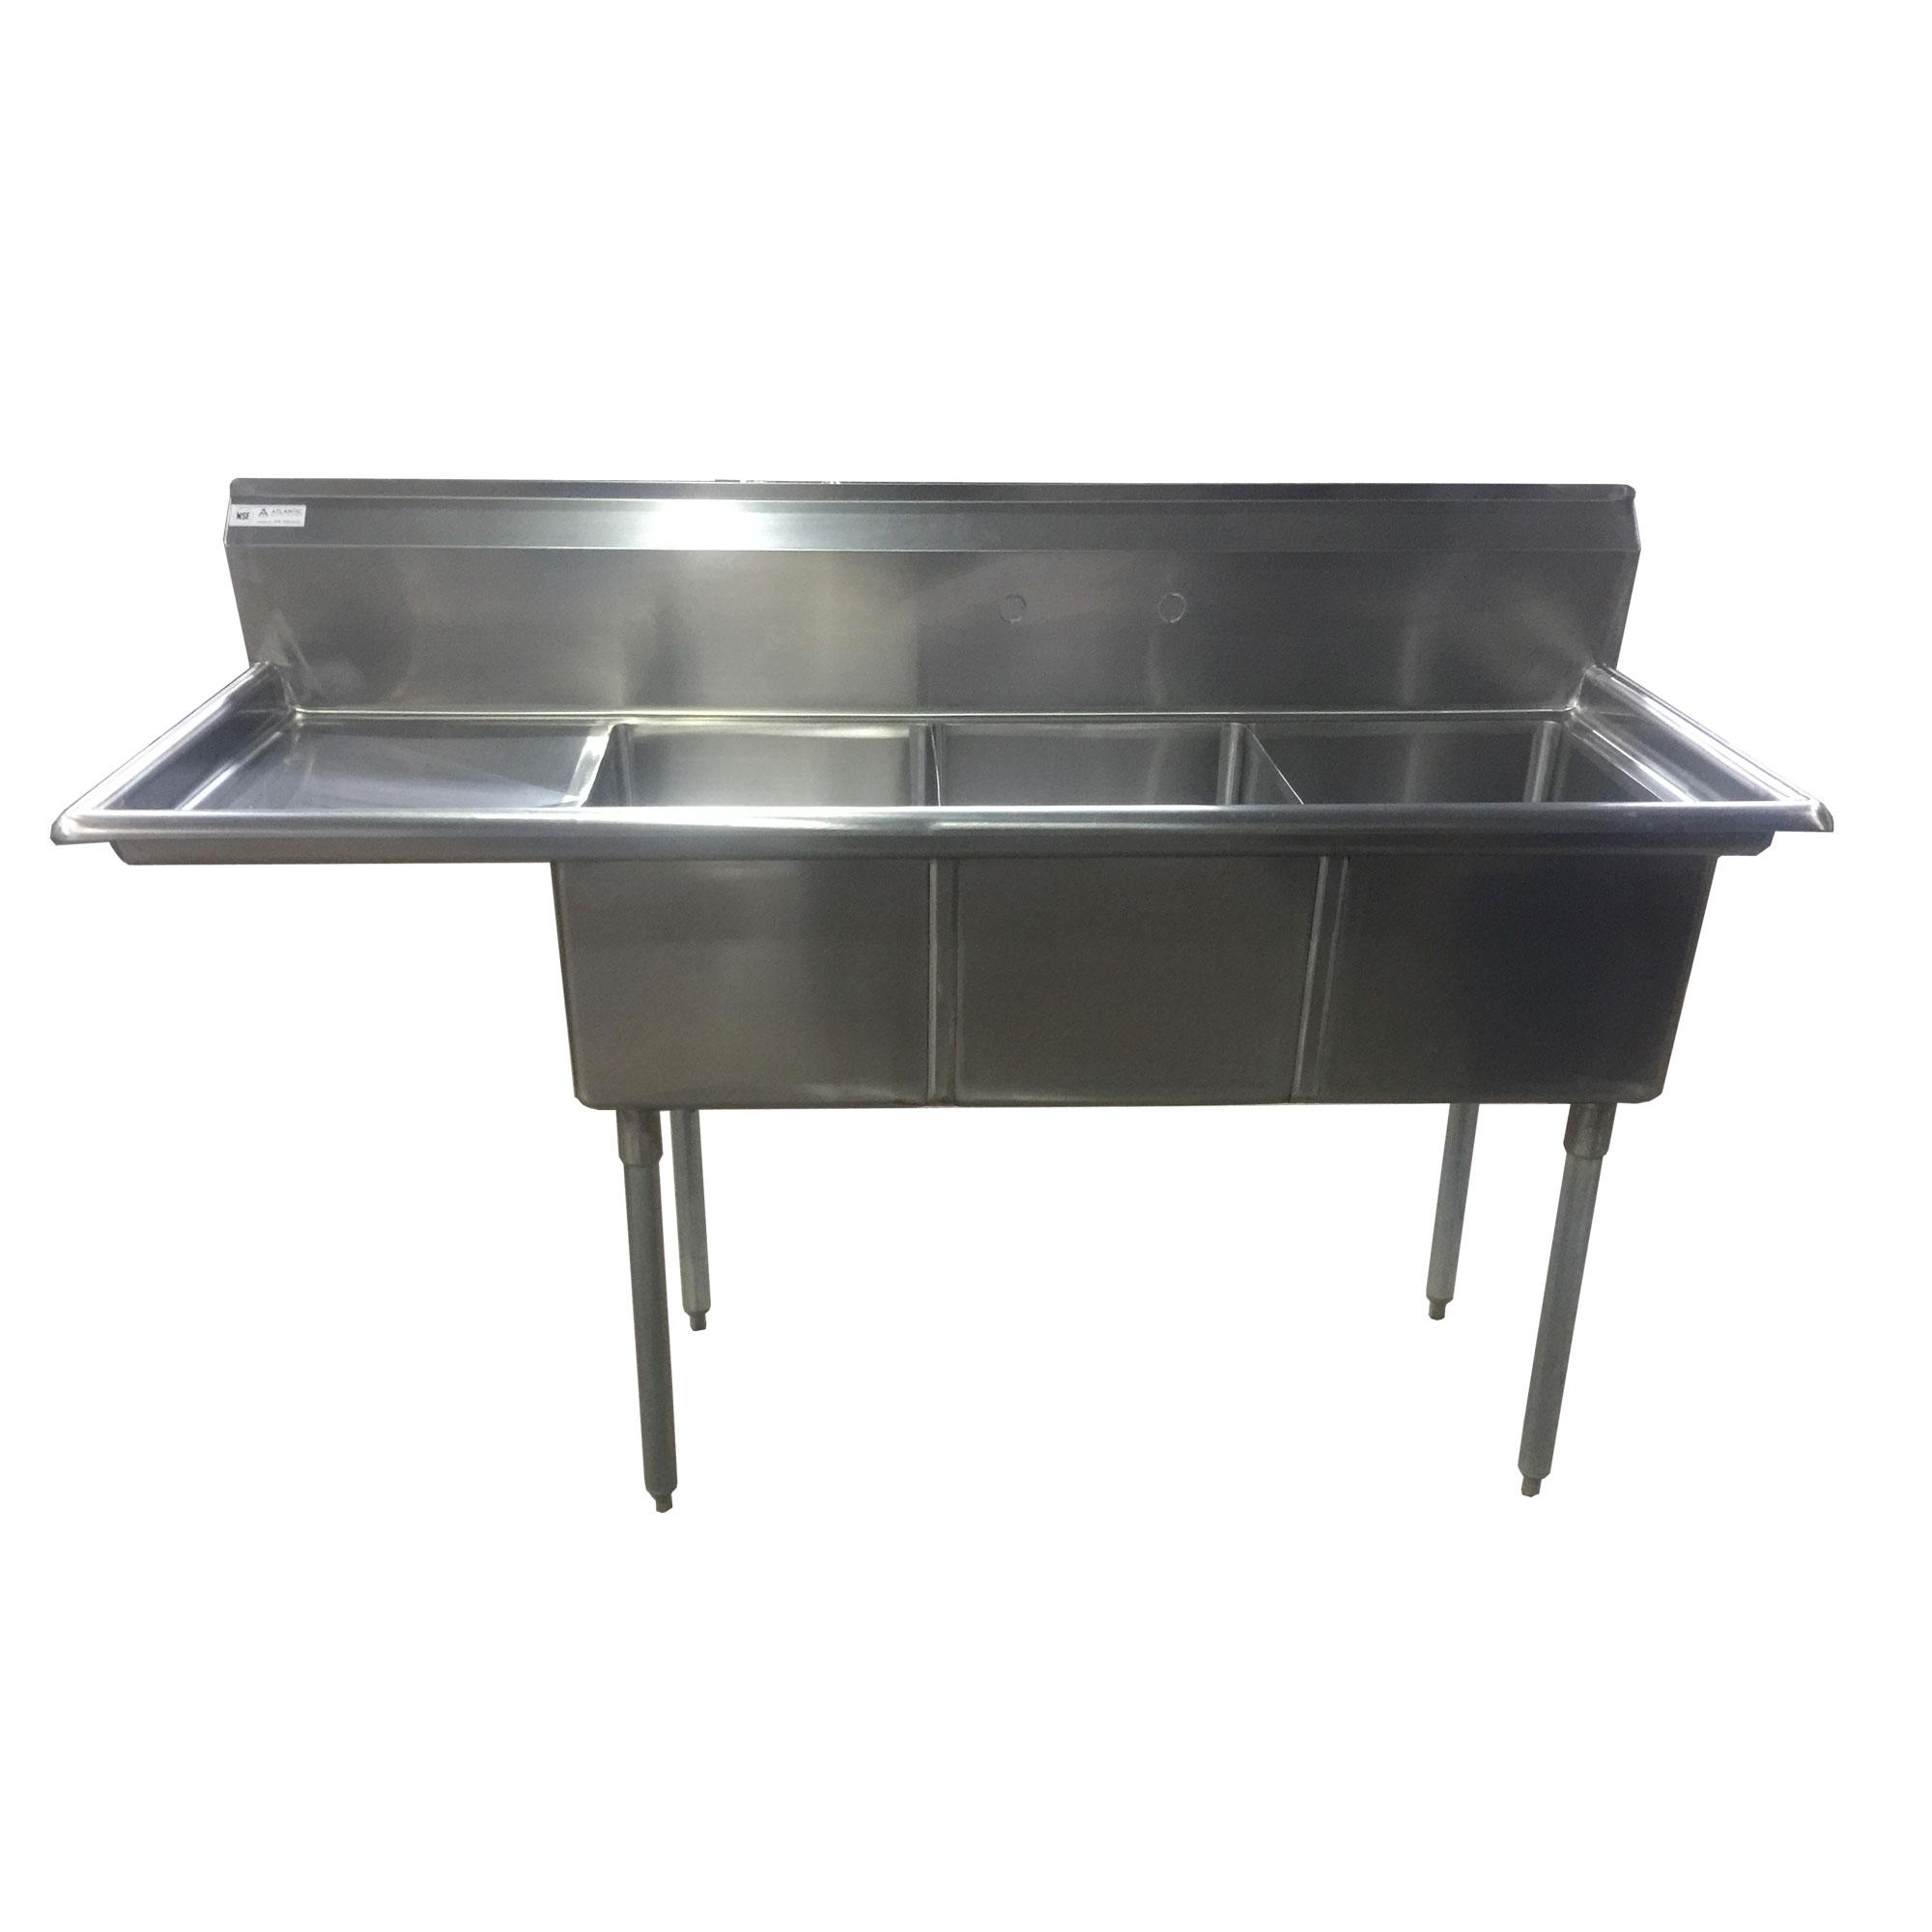 Image of Atlantic Metalworks 3CS-162012-1L/R - Economy 3 Compartment 1 Drainboard Sink